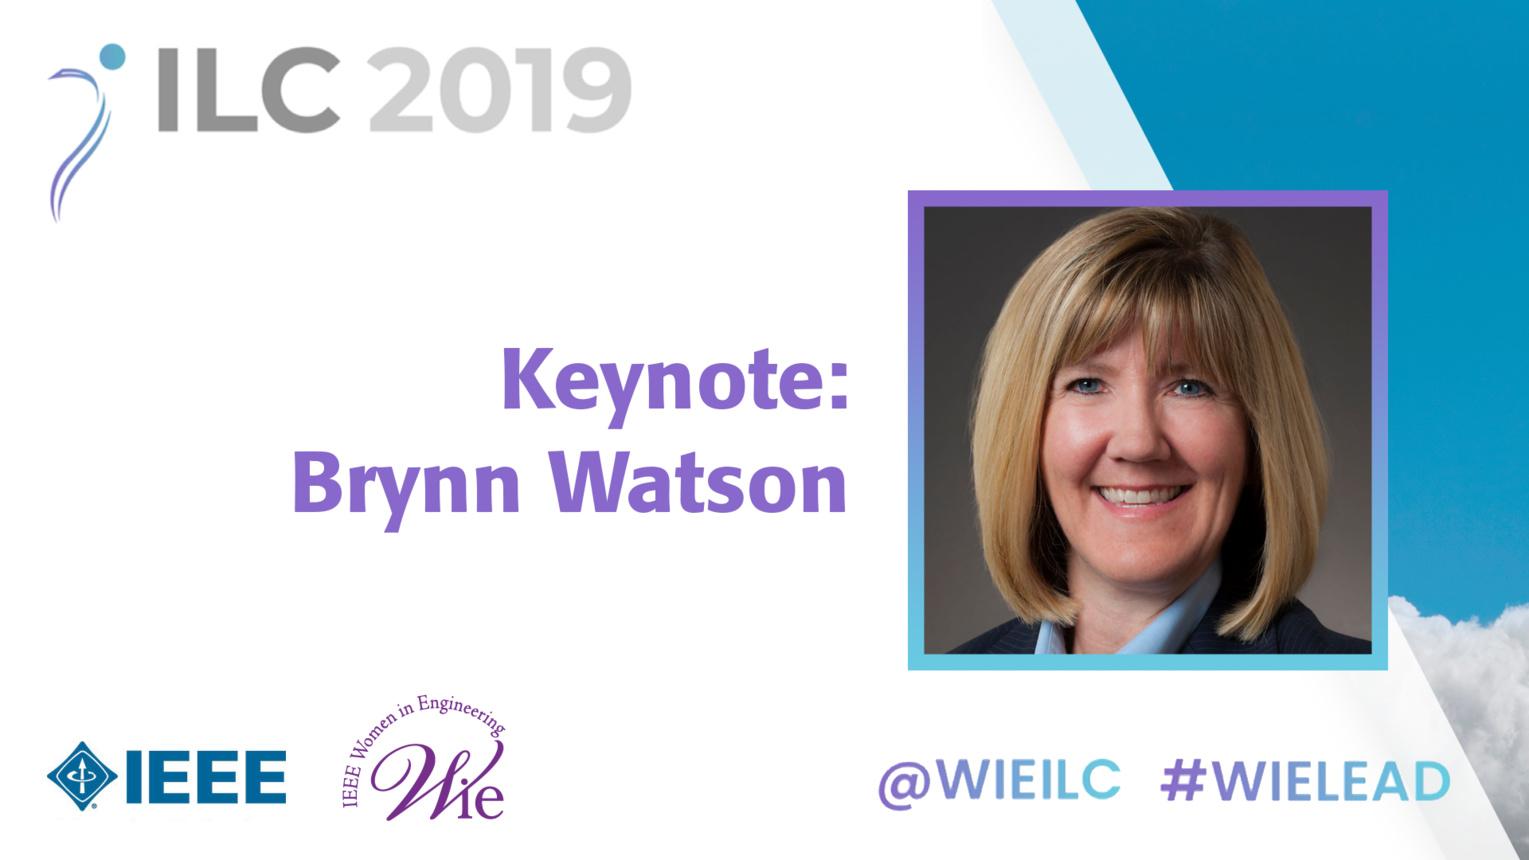 Keynote: Brynn Watson - WIE ILC 2019